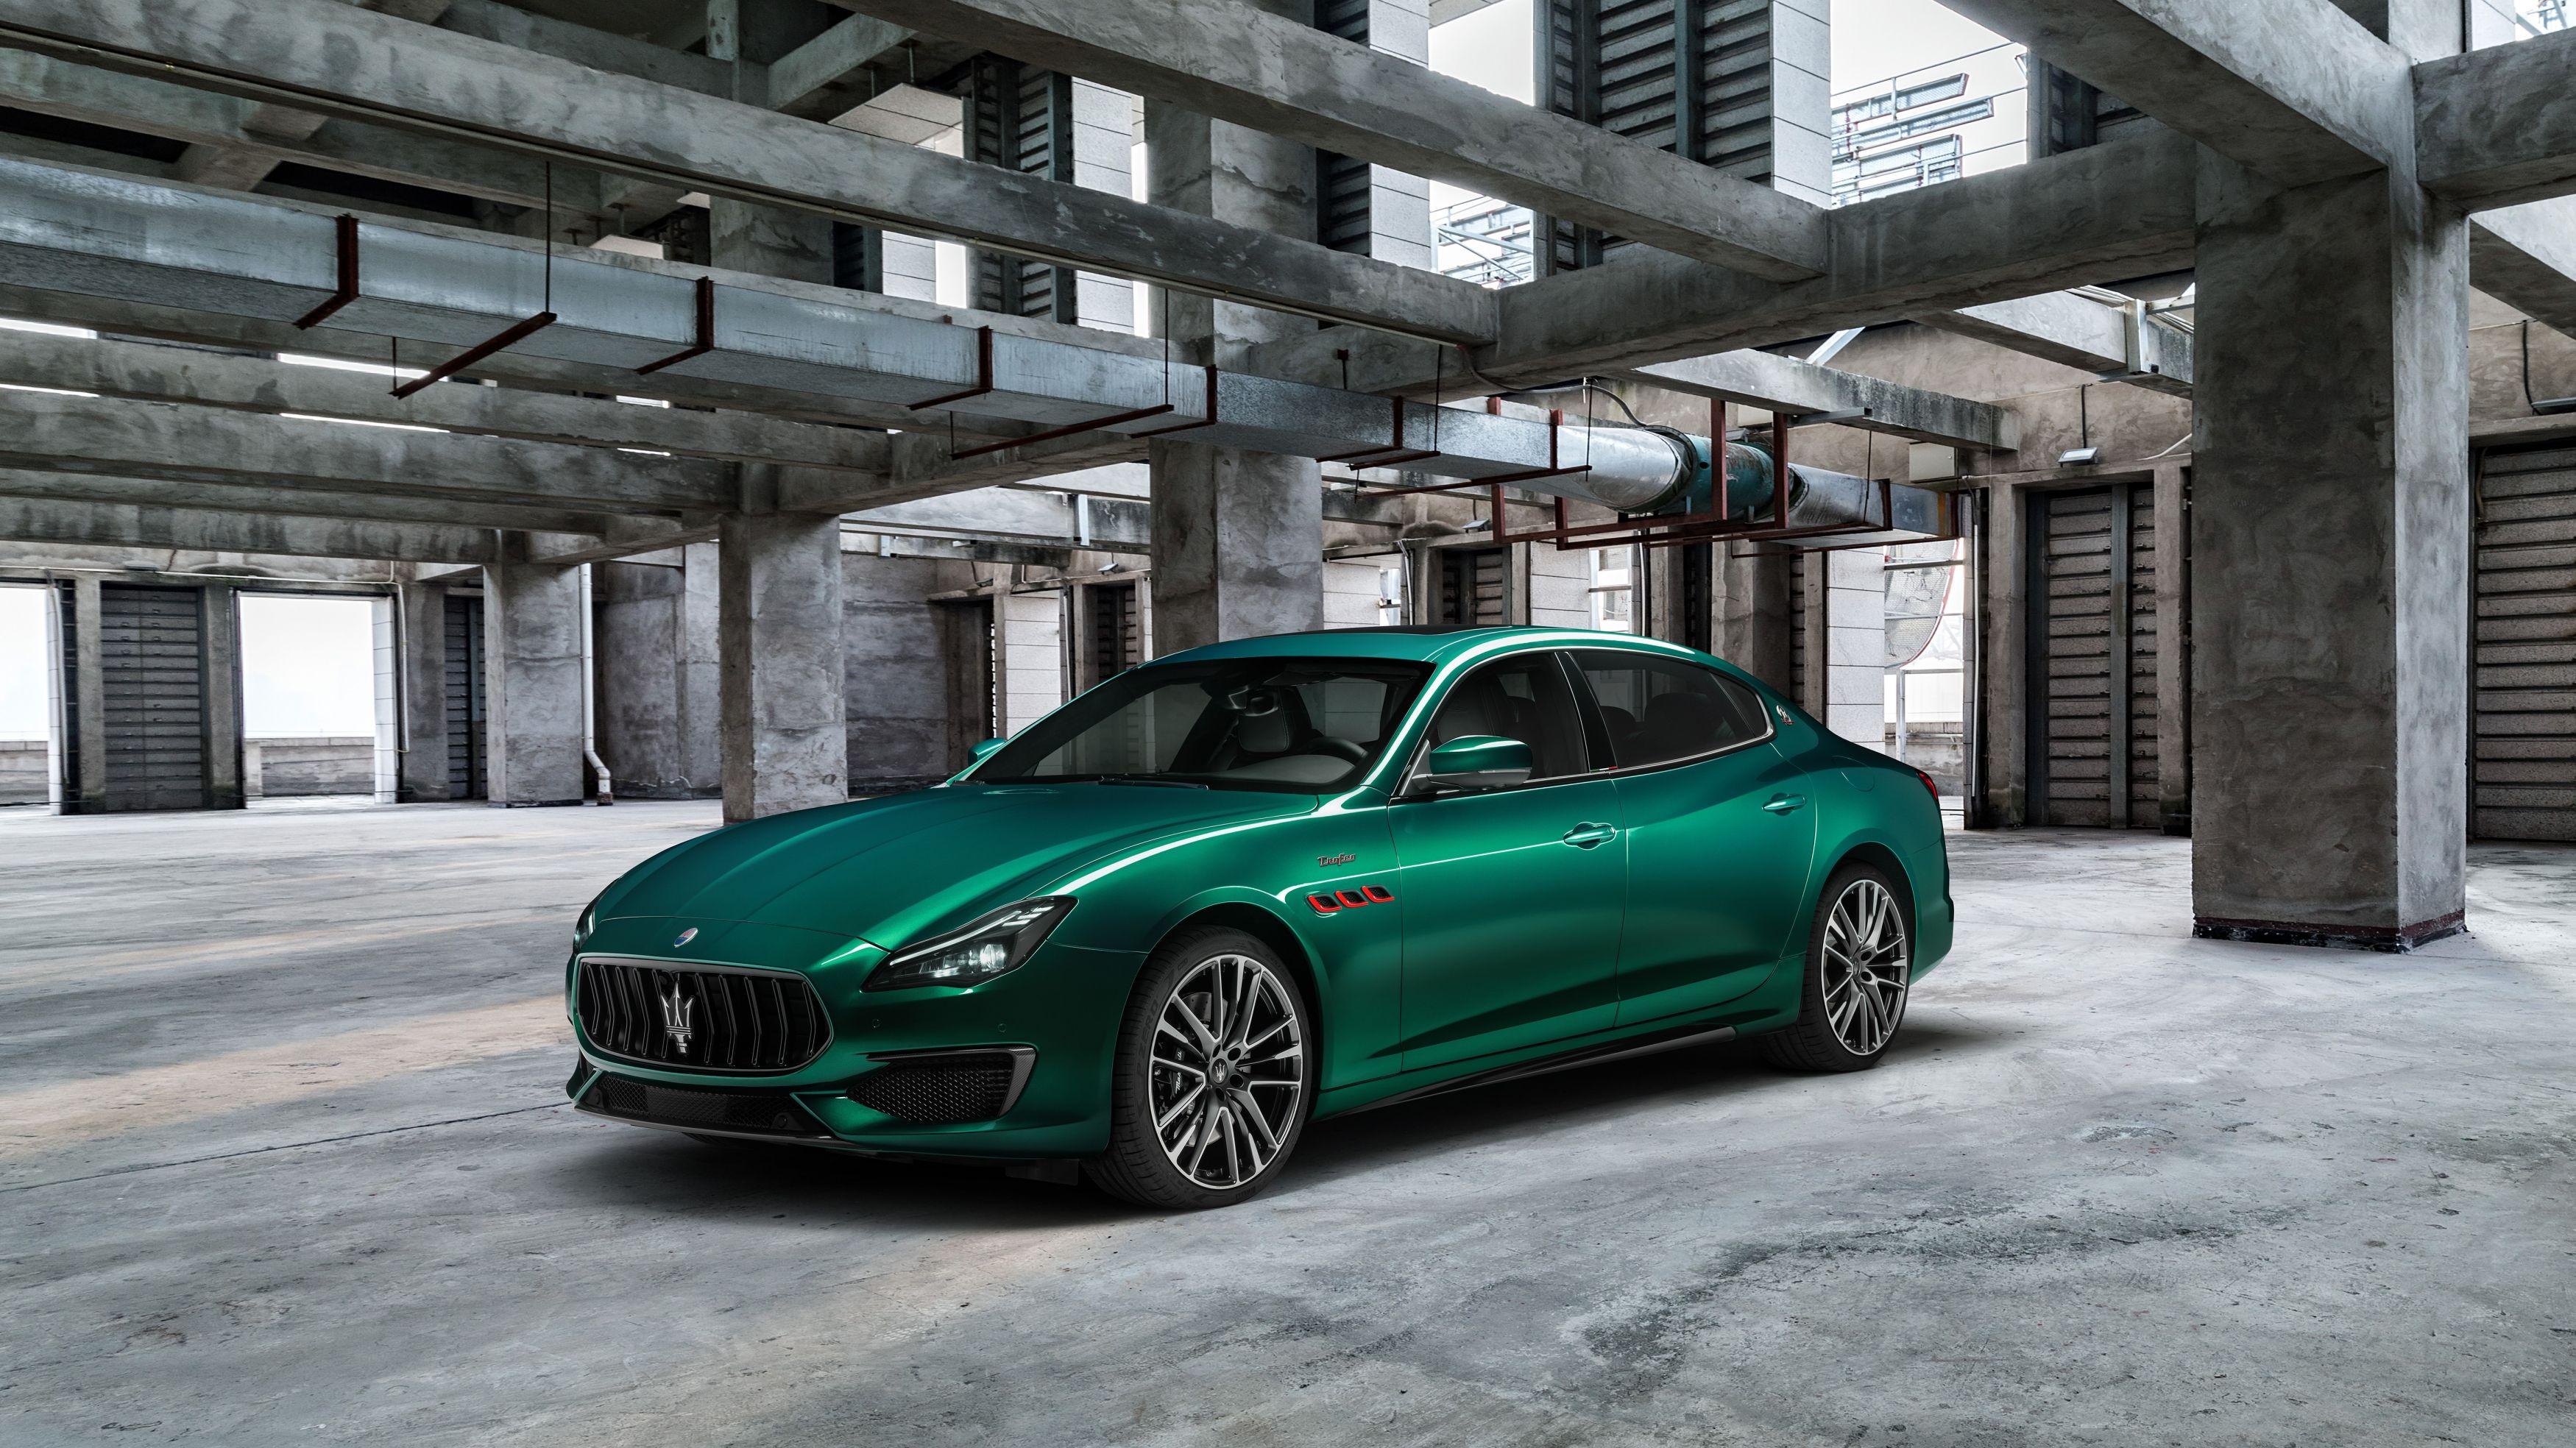 2021 Maserati Quattroporte Review, Pricing, And Specs - NewsOpener